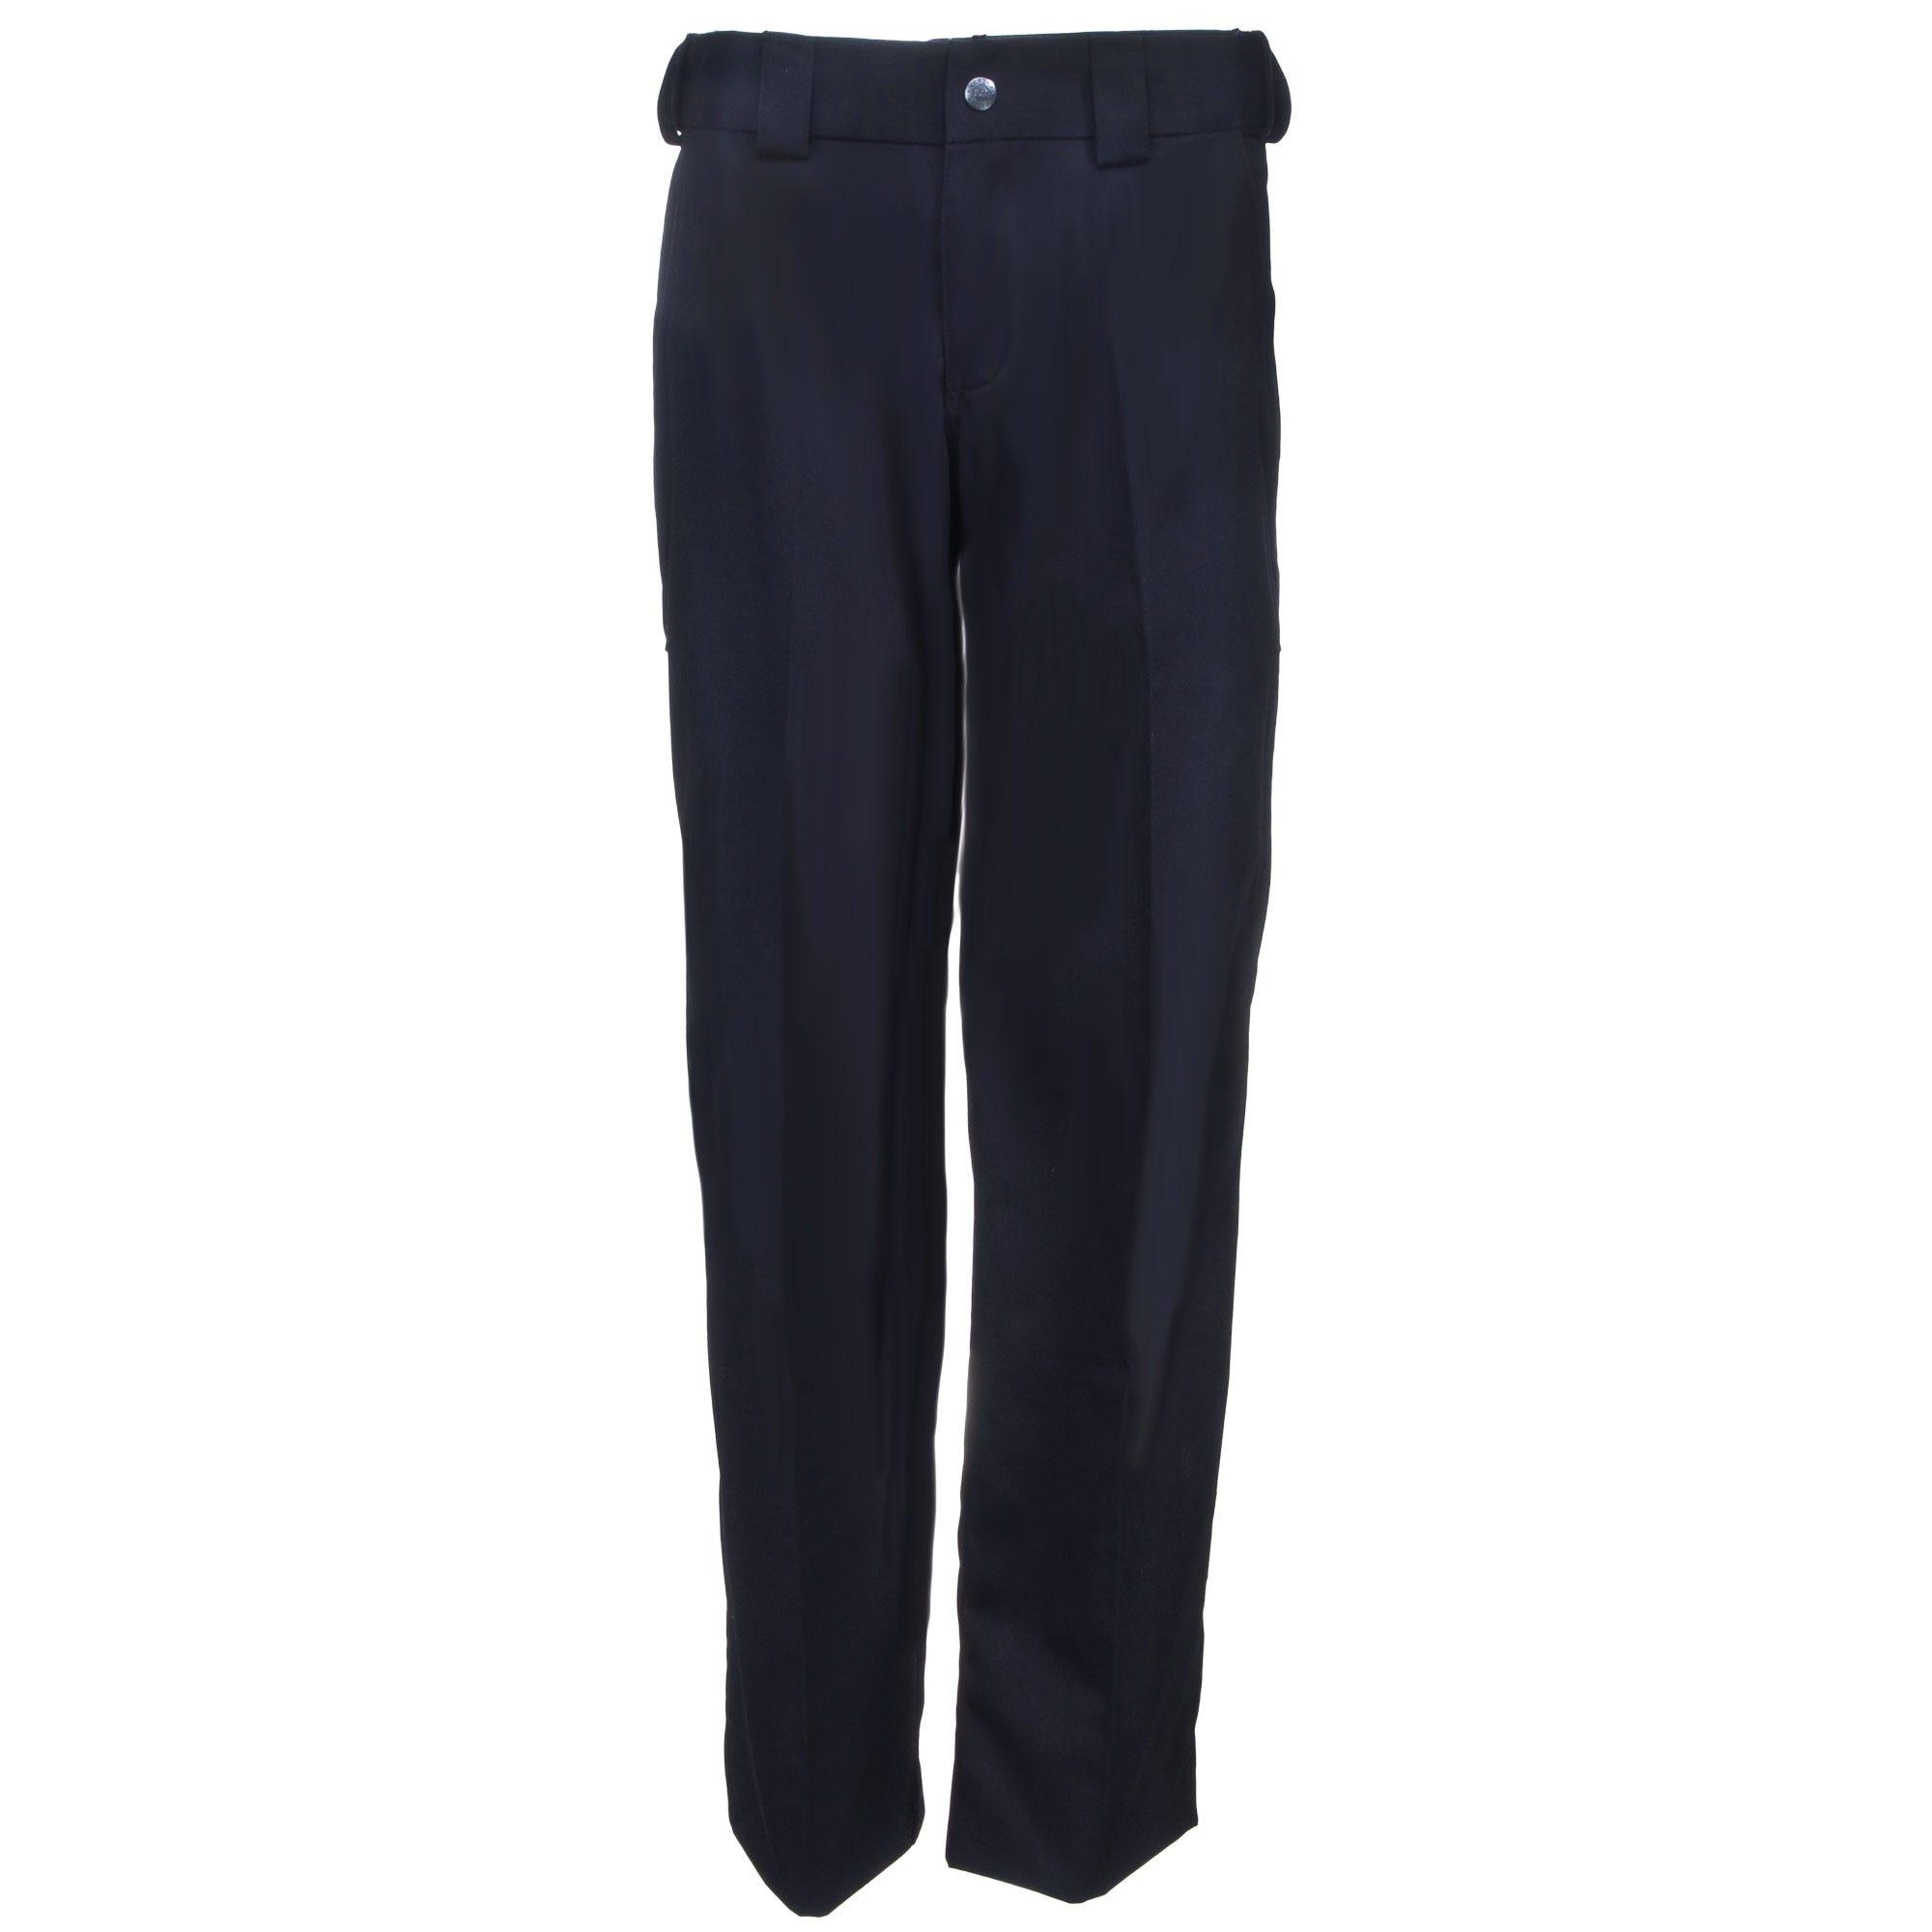 5.11 Tactical Women's 64400 750 Stryke Midnight Navy Blue Pants